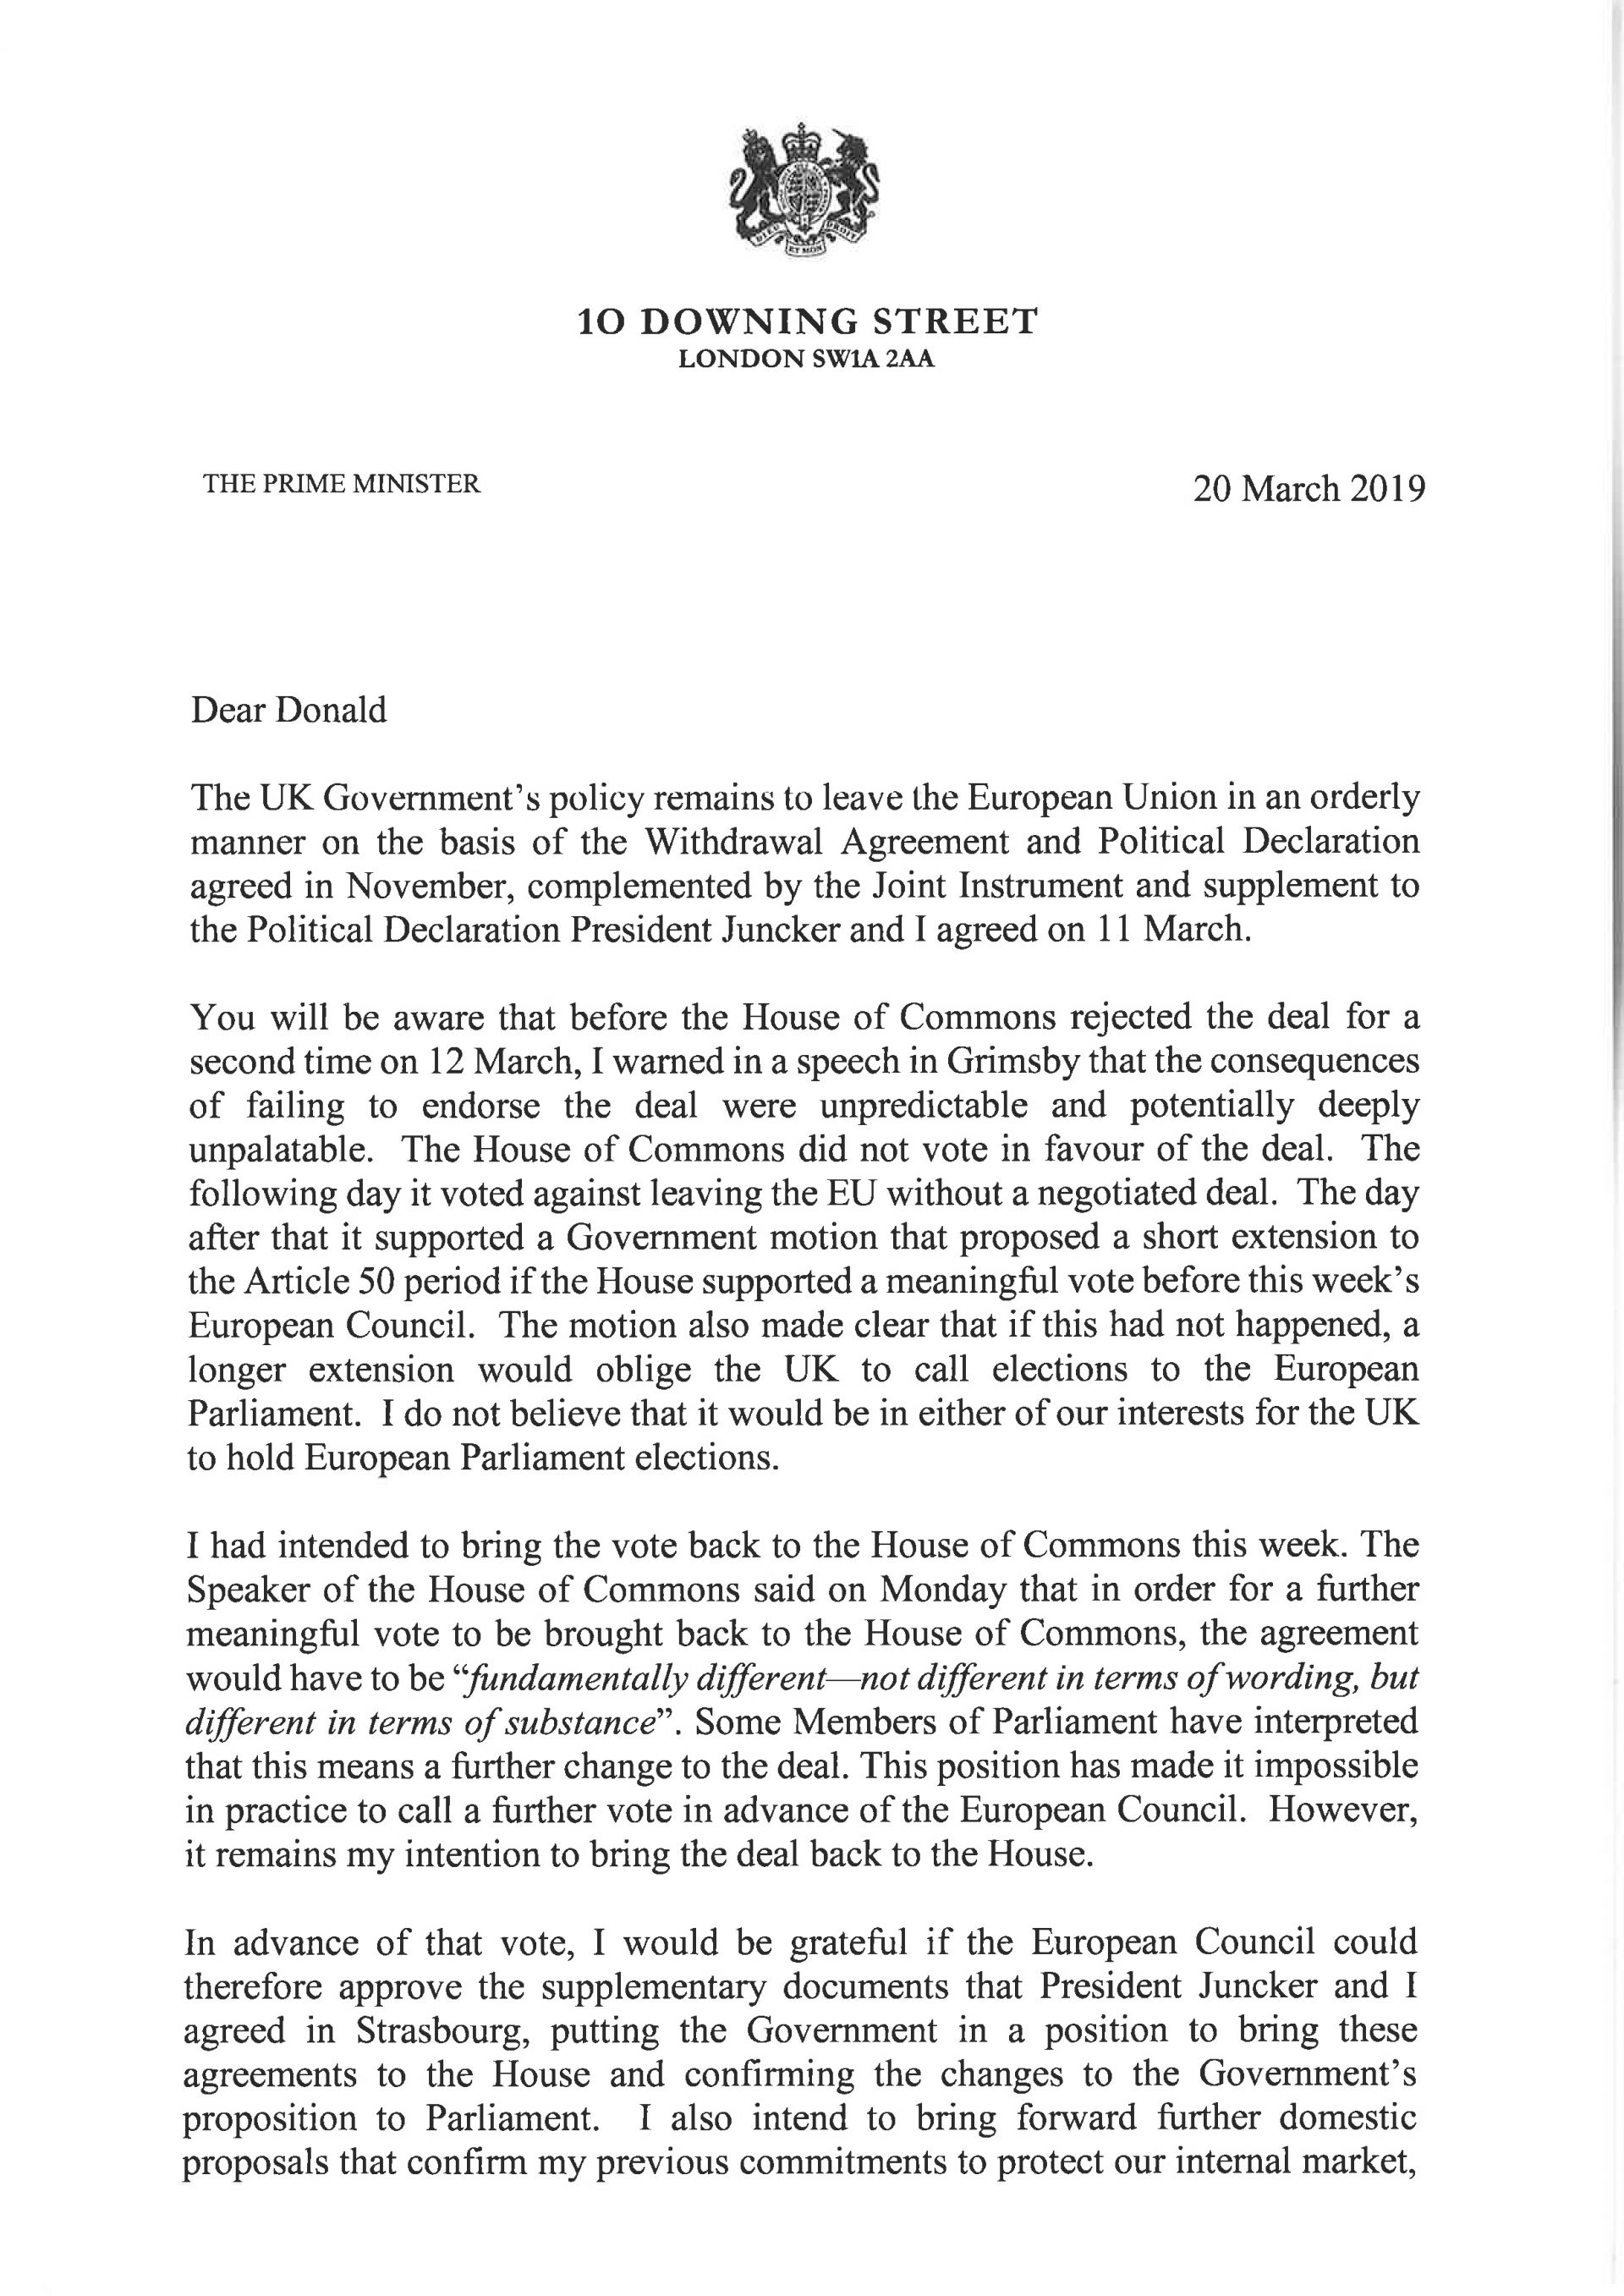 Писмото до Доналд Туск